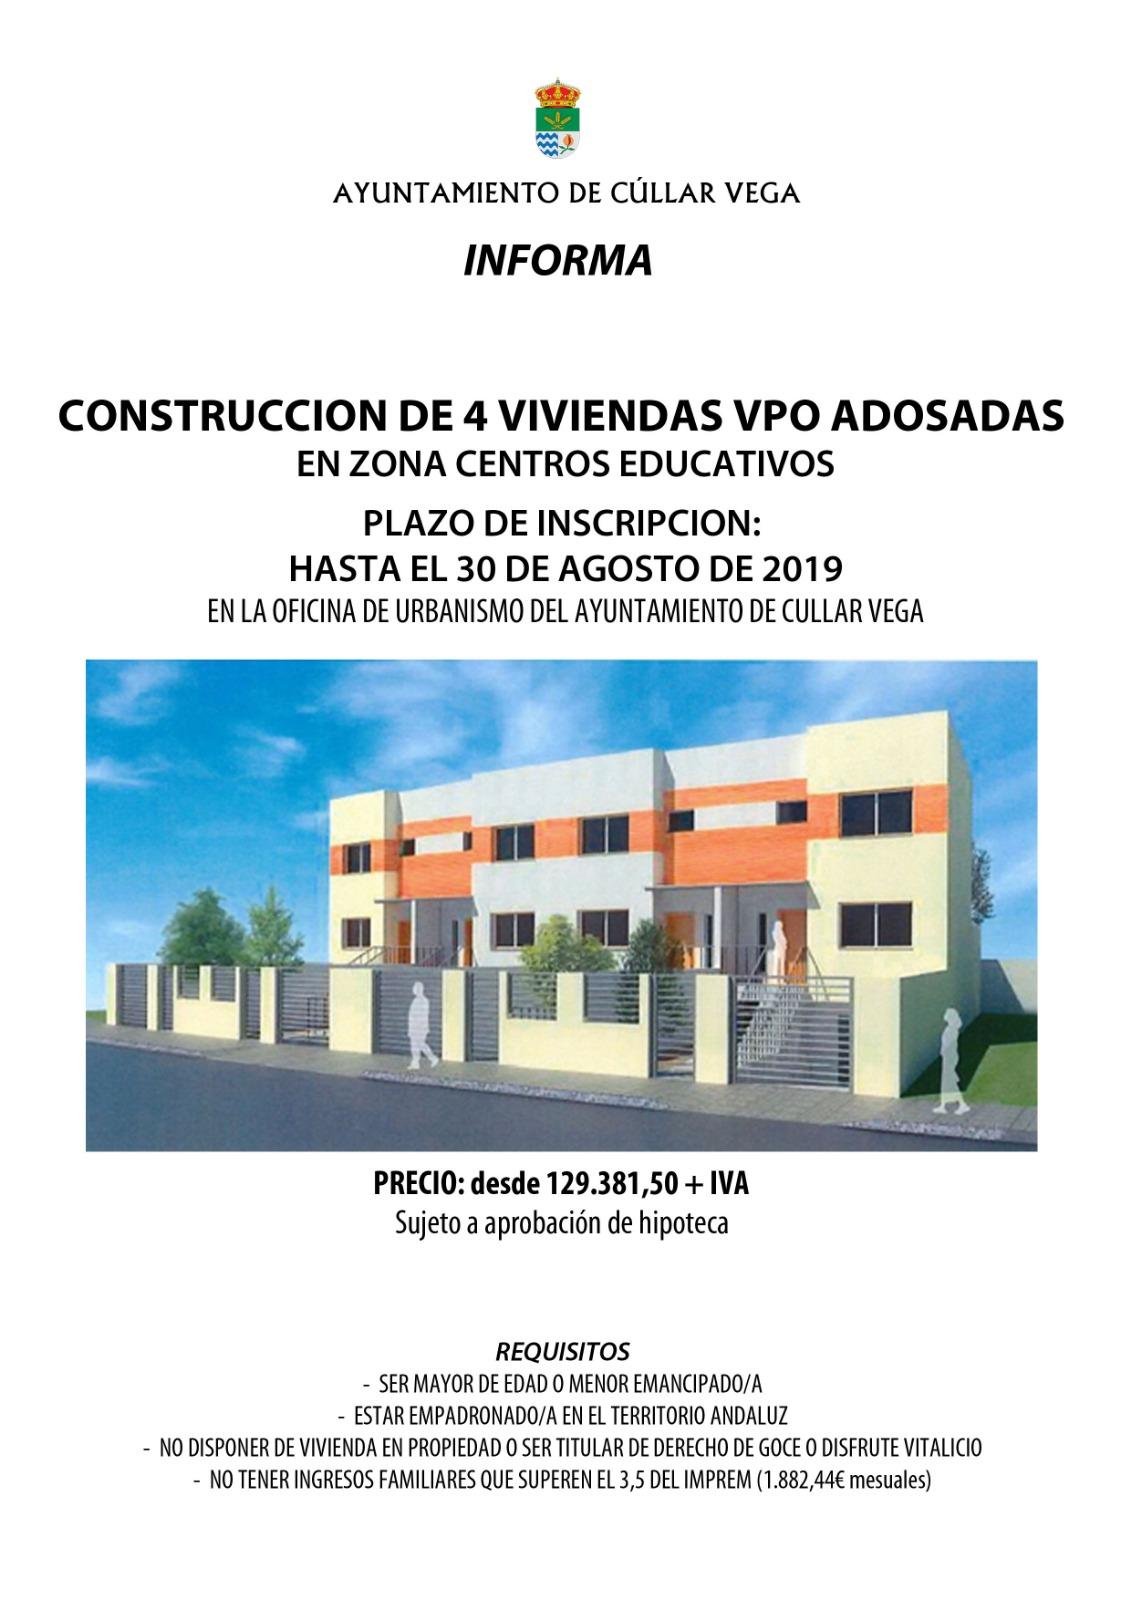 Construcción de 4 Viviendas VPO Adosadas en Cúllar Vega